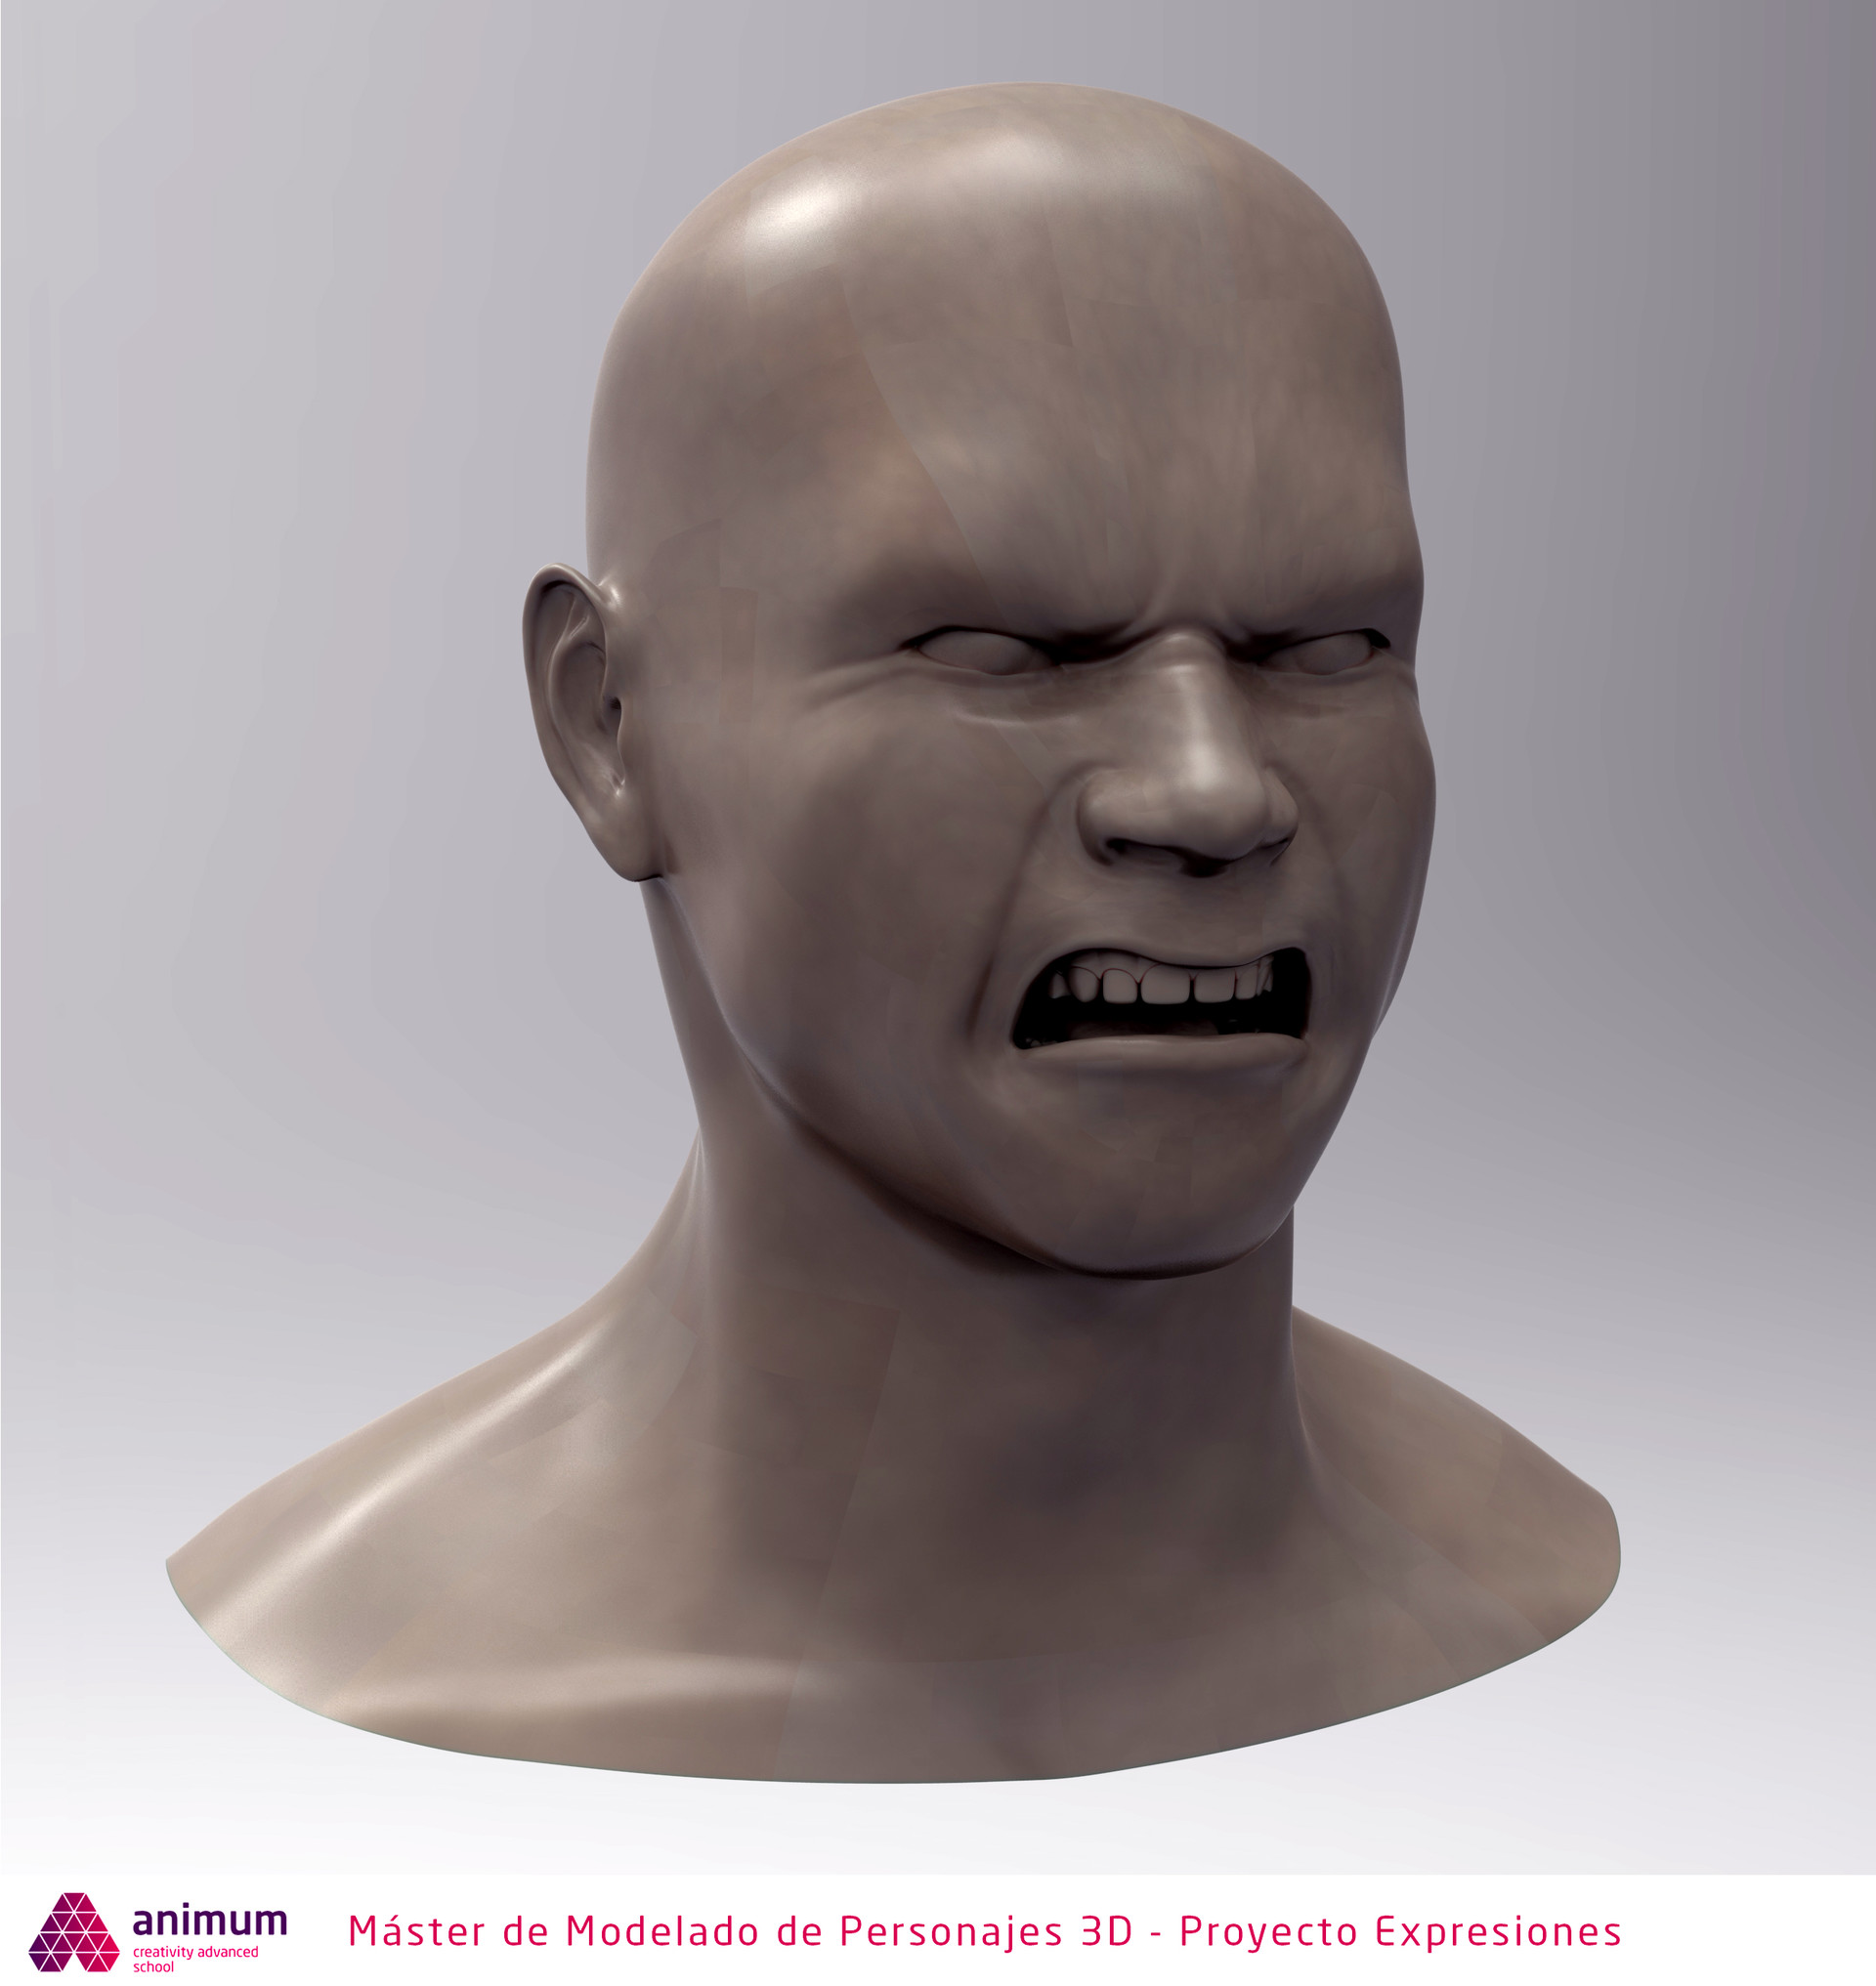 Eusebio hb ira